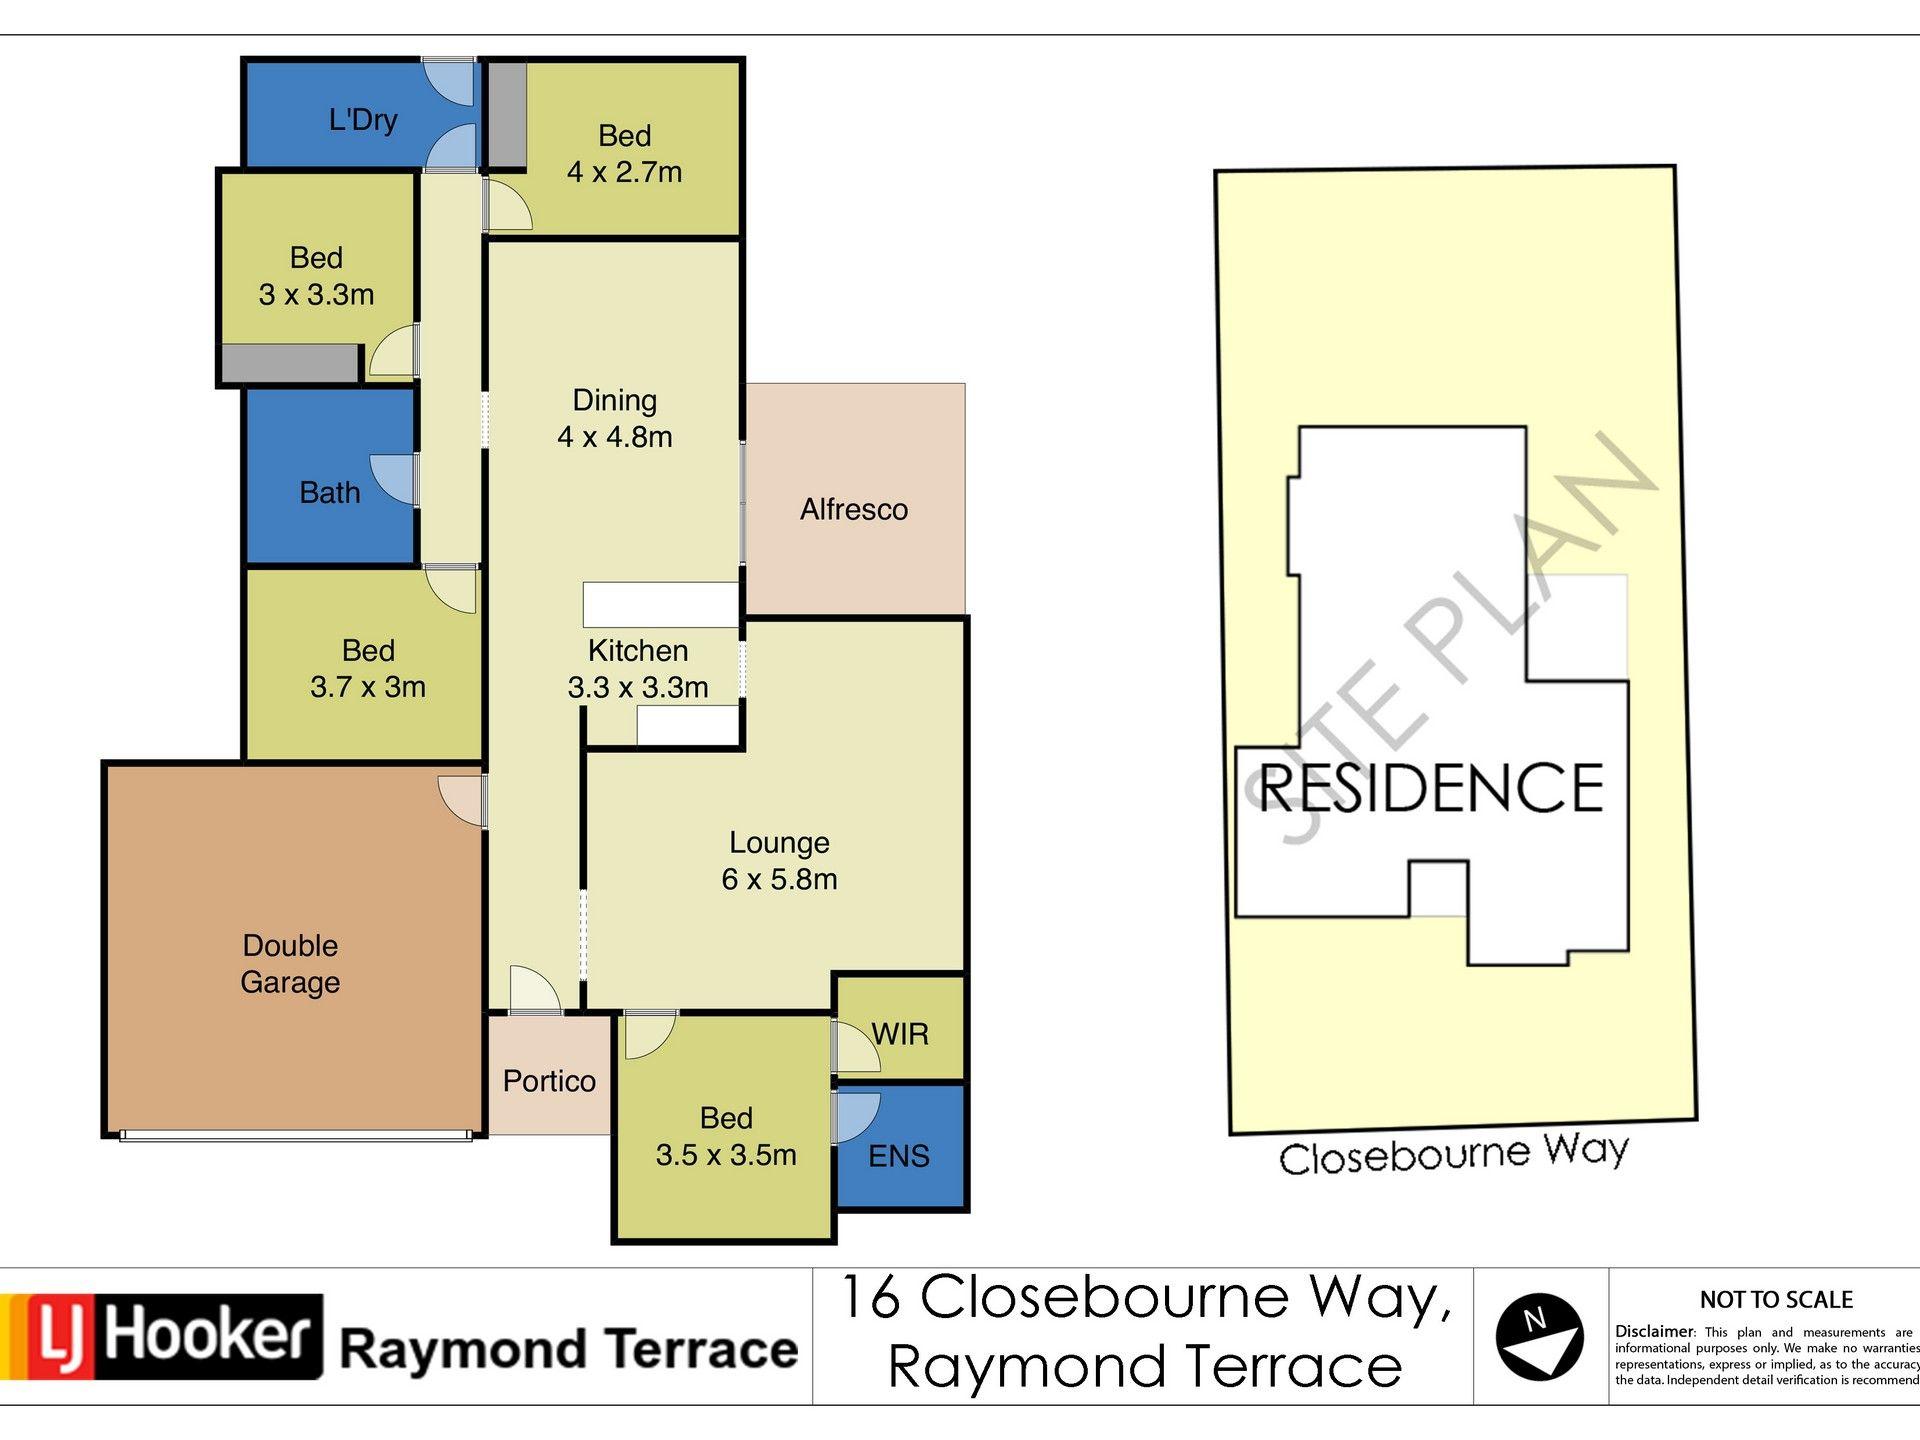 16 Closebourne Way RAYMOND TERRACE 2324